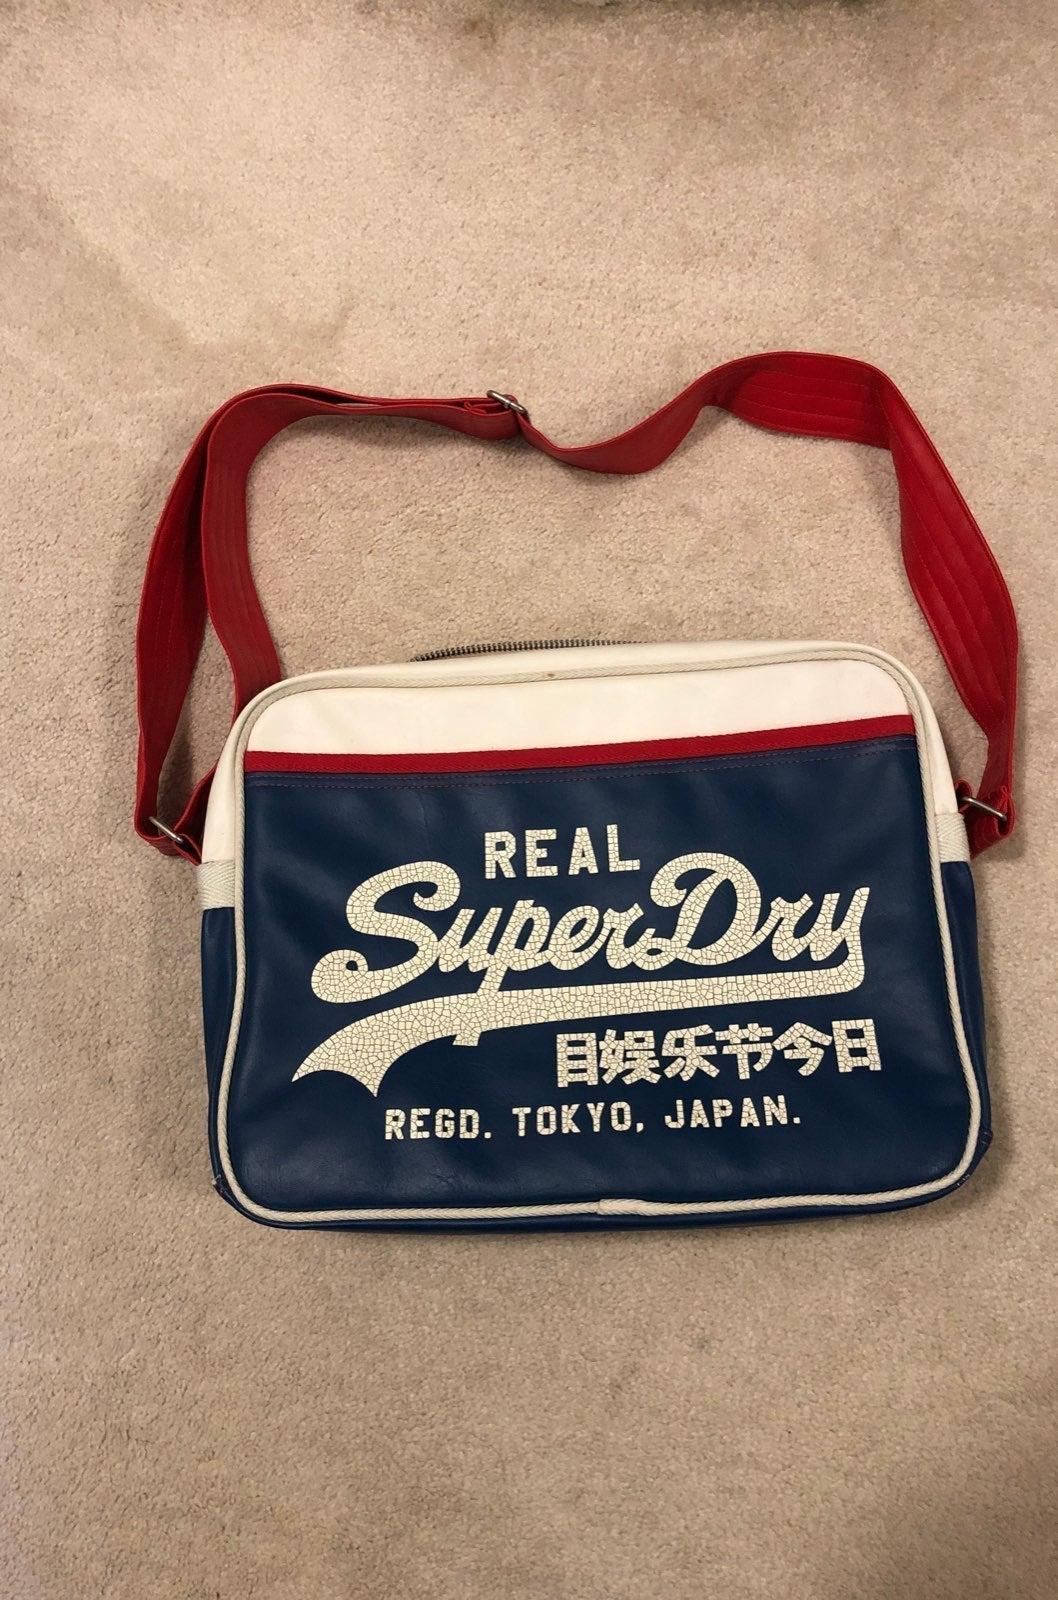 Super Dry Men's Messenger Bag